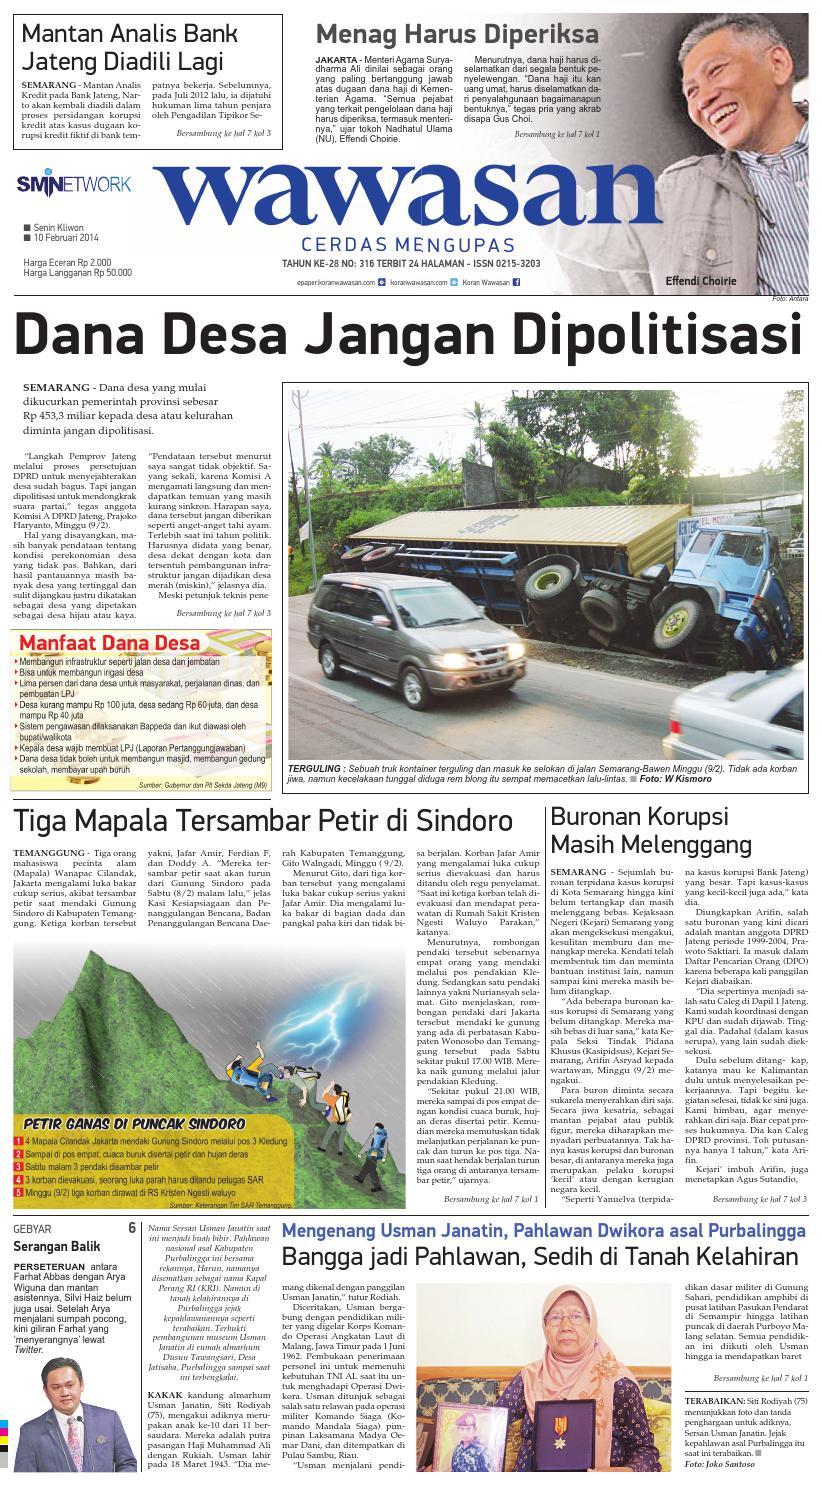 Wawasan 10 Februari 2014 By Koran Pagi Issuu Kopibubuk Robusta Toko Rezeki Akumandiri Malang